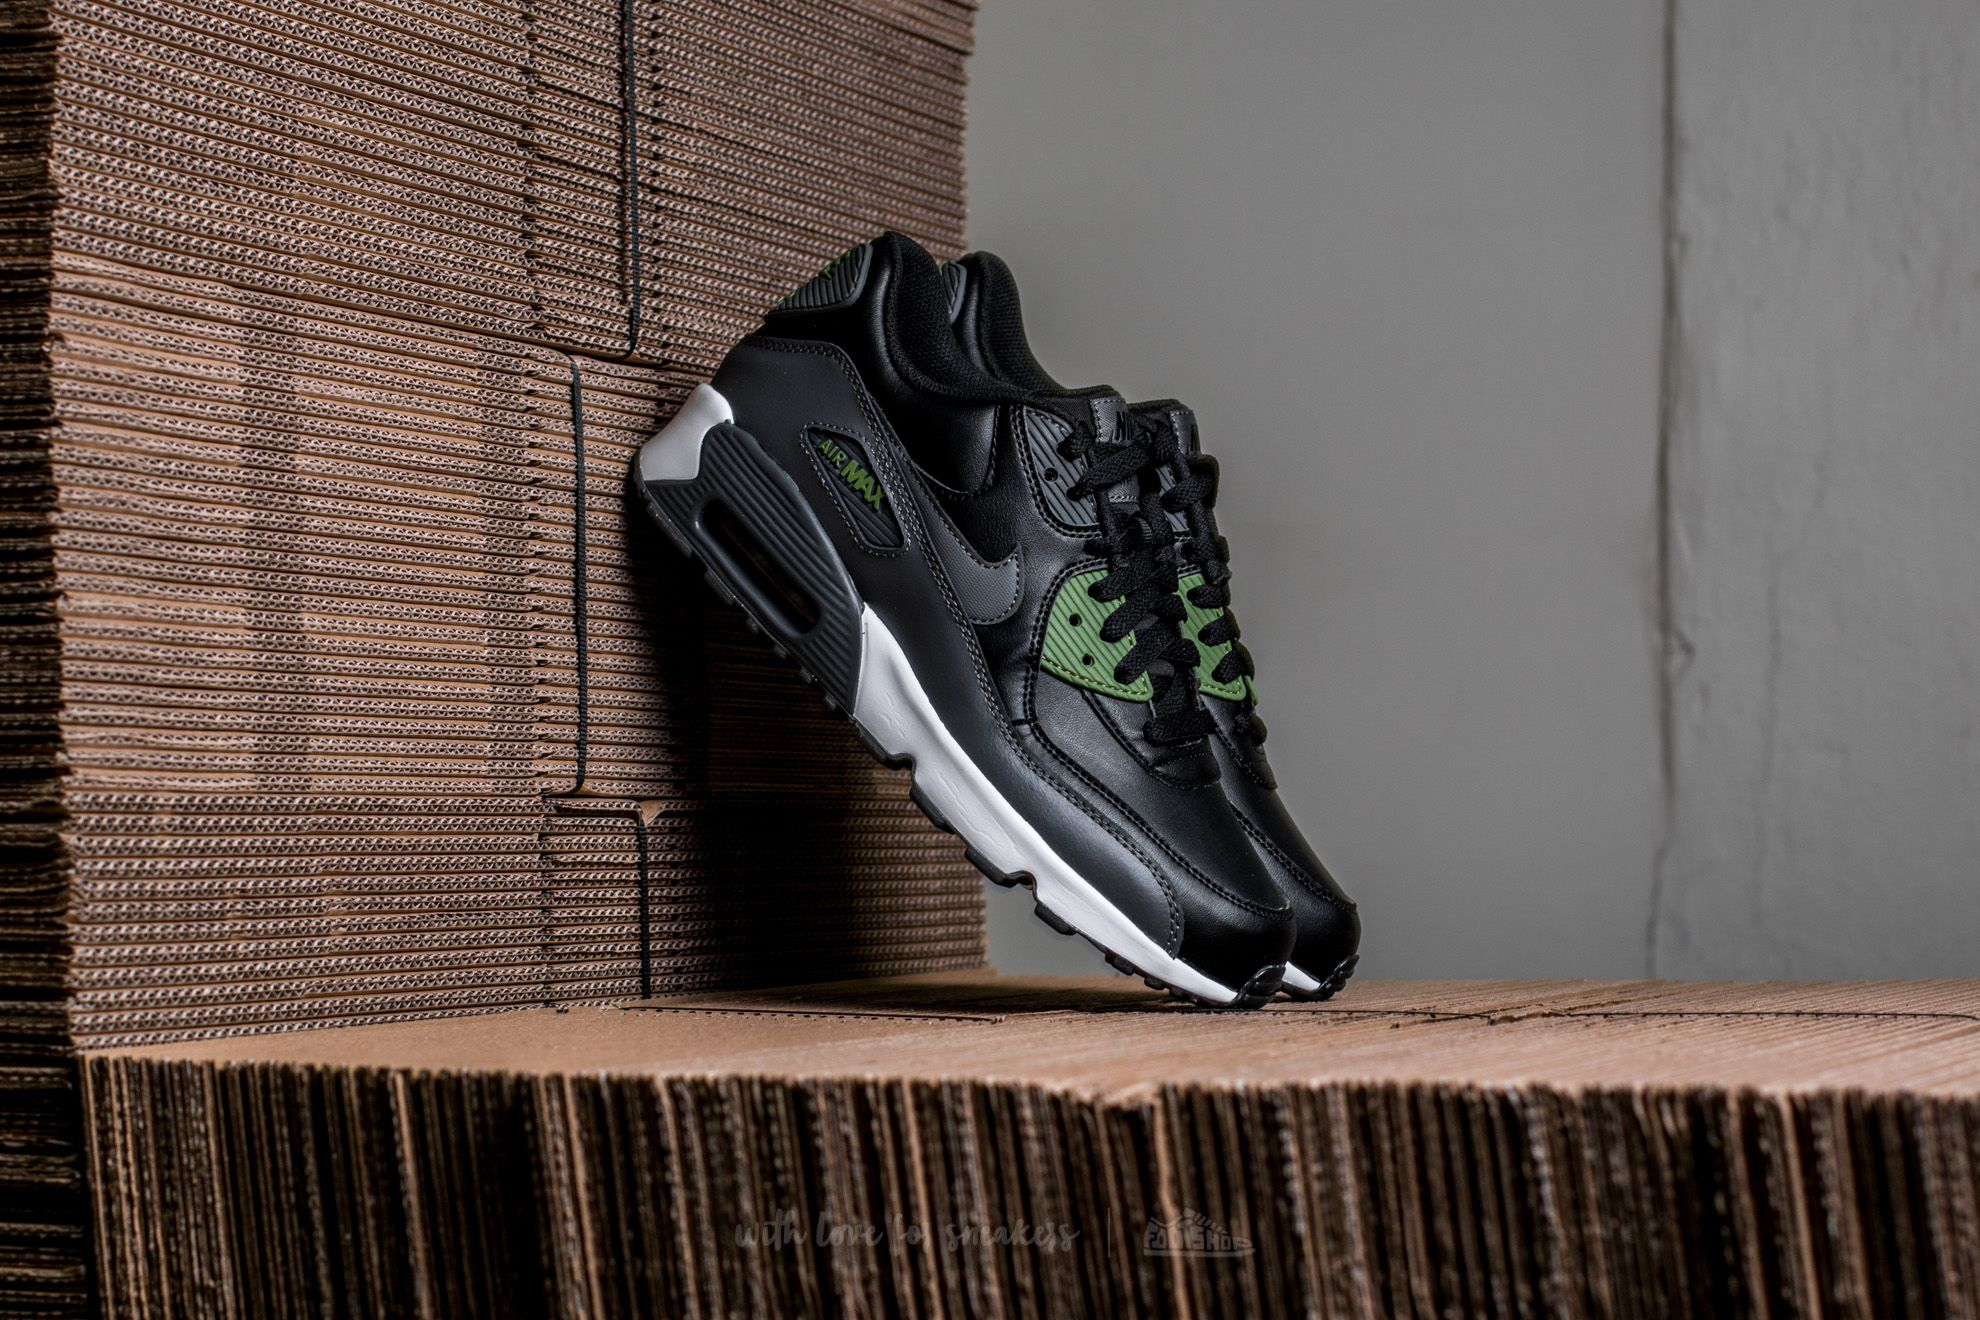 sale retailer 6f564 f7ed6 Nike Air Max 90 Leather (GS). Black  Dark Grey-Palm Green